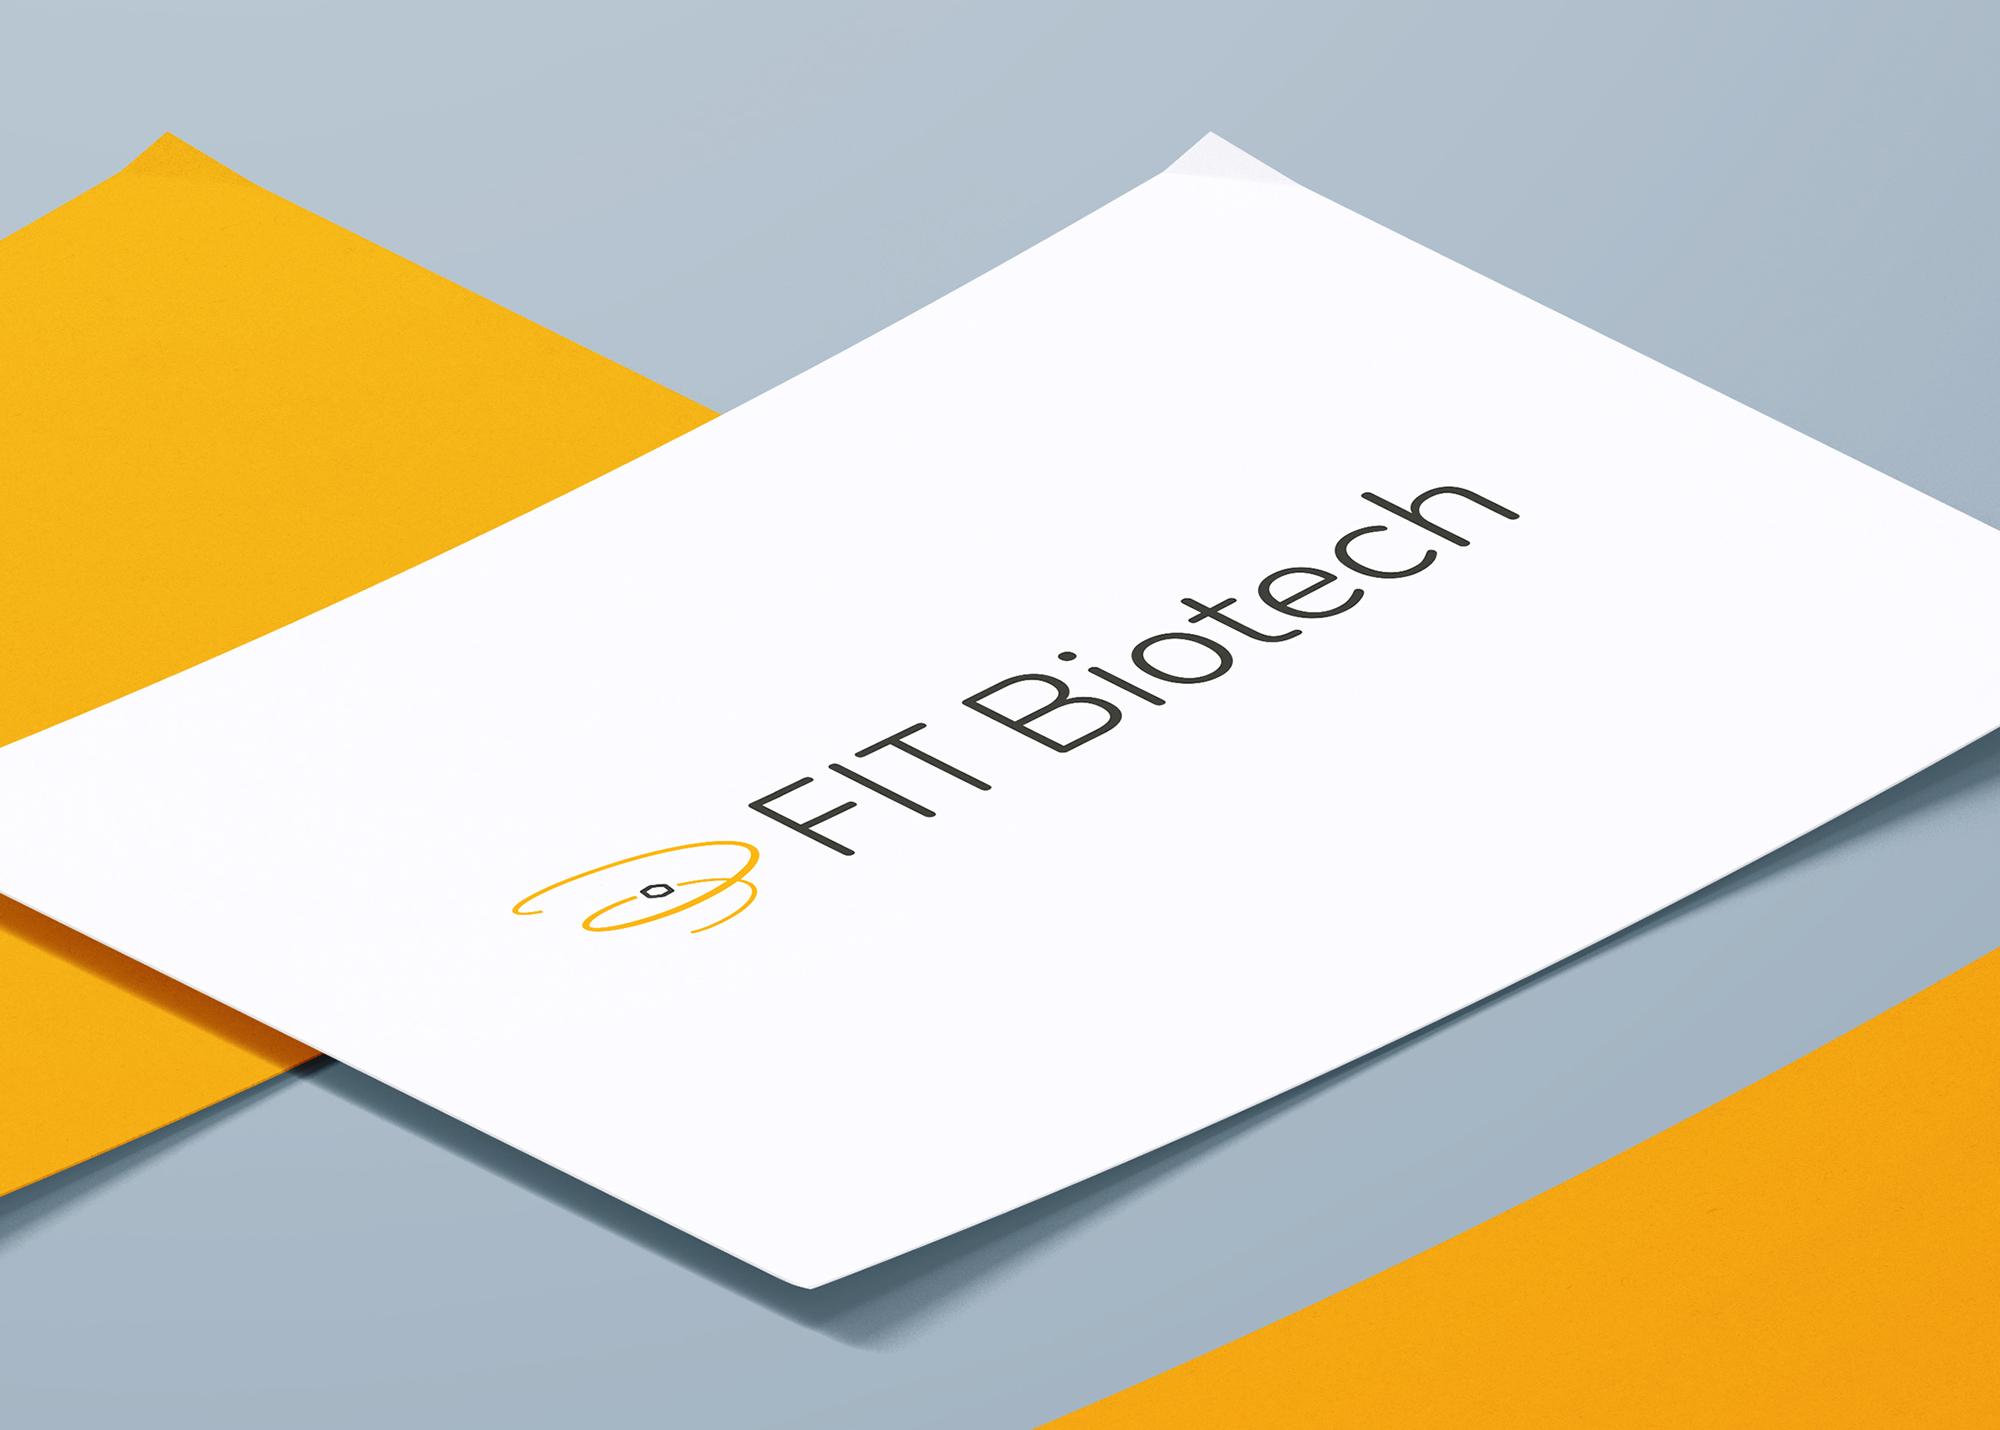 FITbiotech_logo_on_paper.jpg